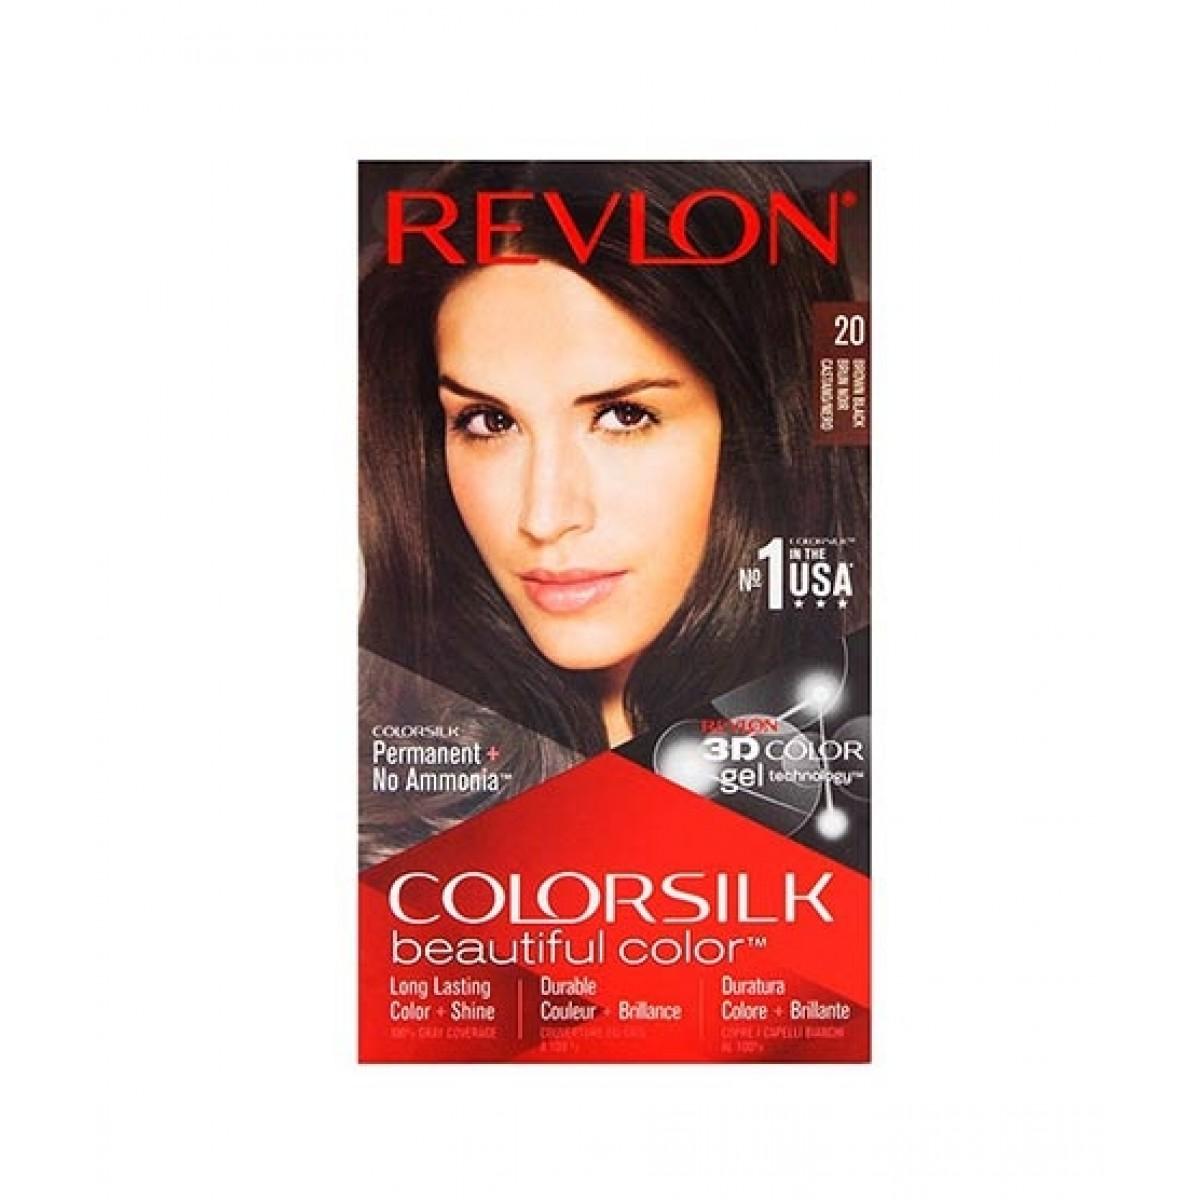 Revlon ColorSilk Hair Color (20 Brown Black)